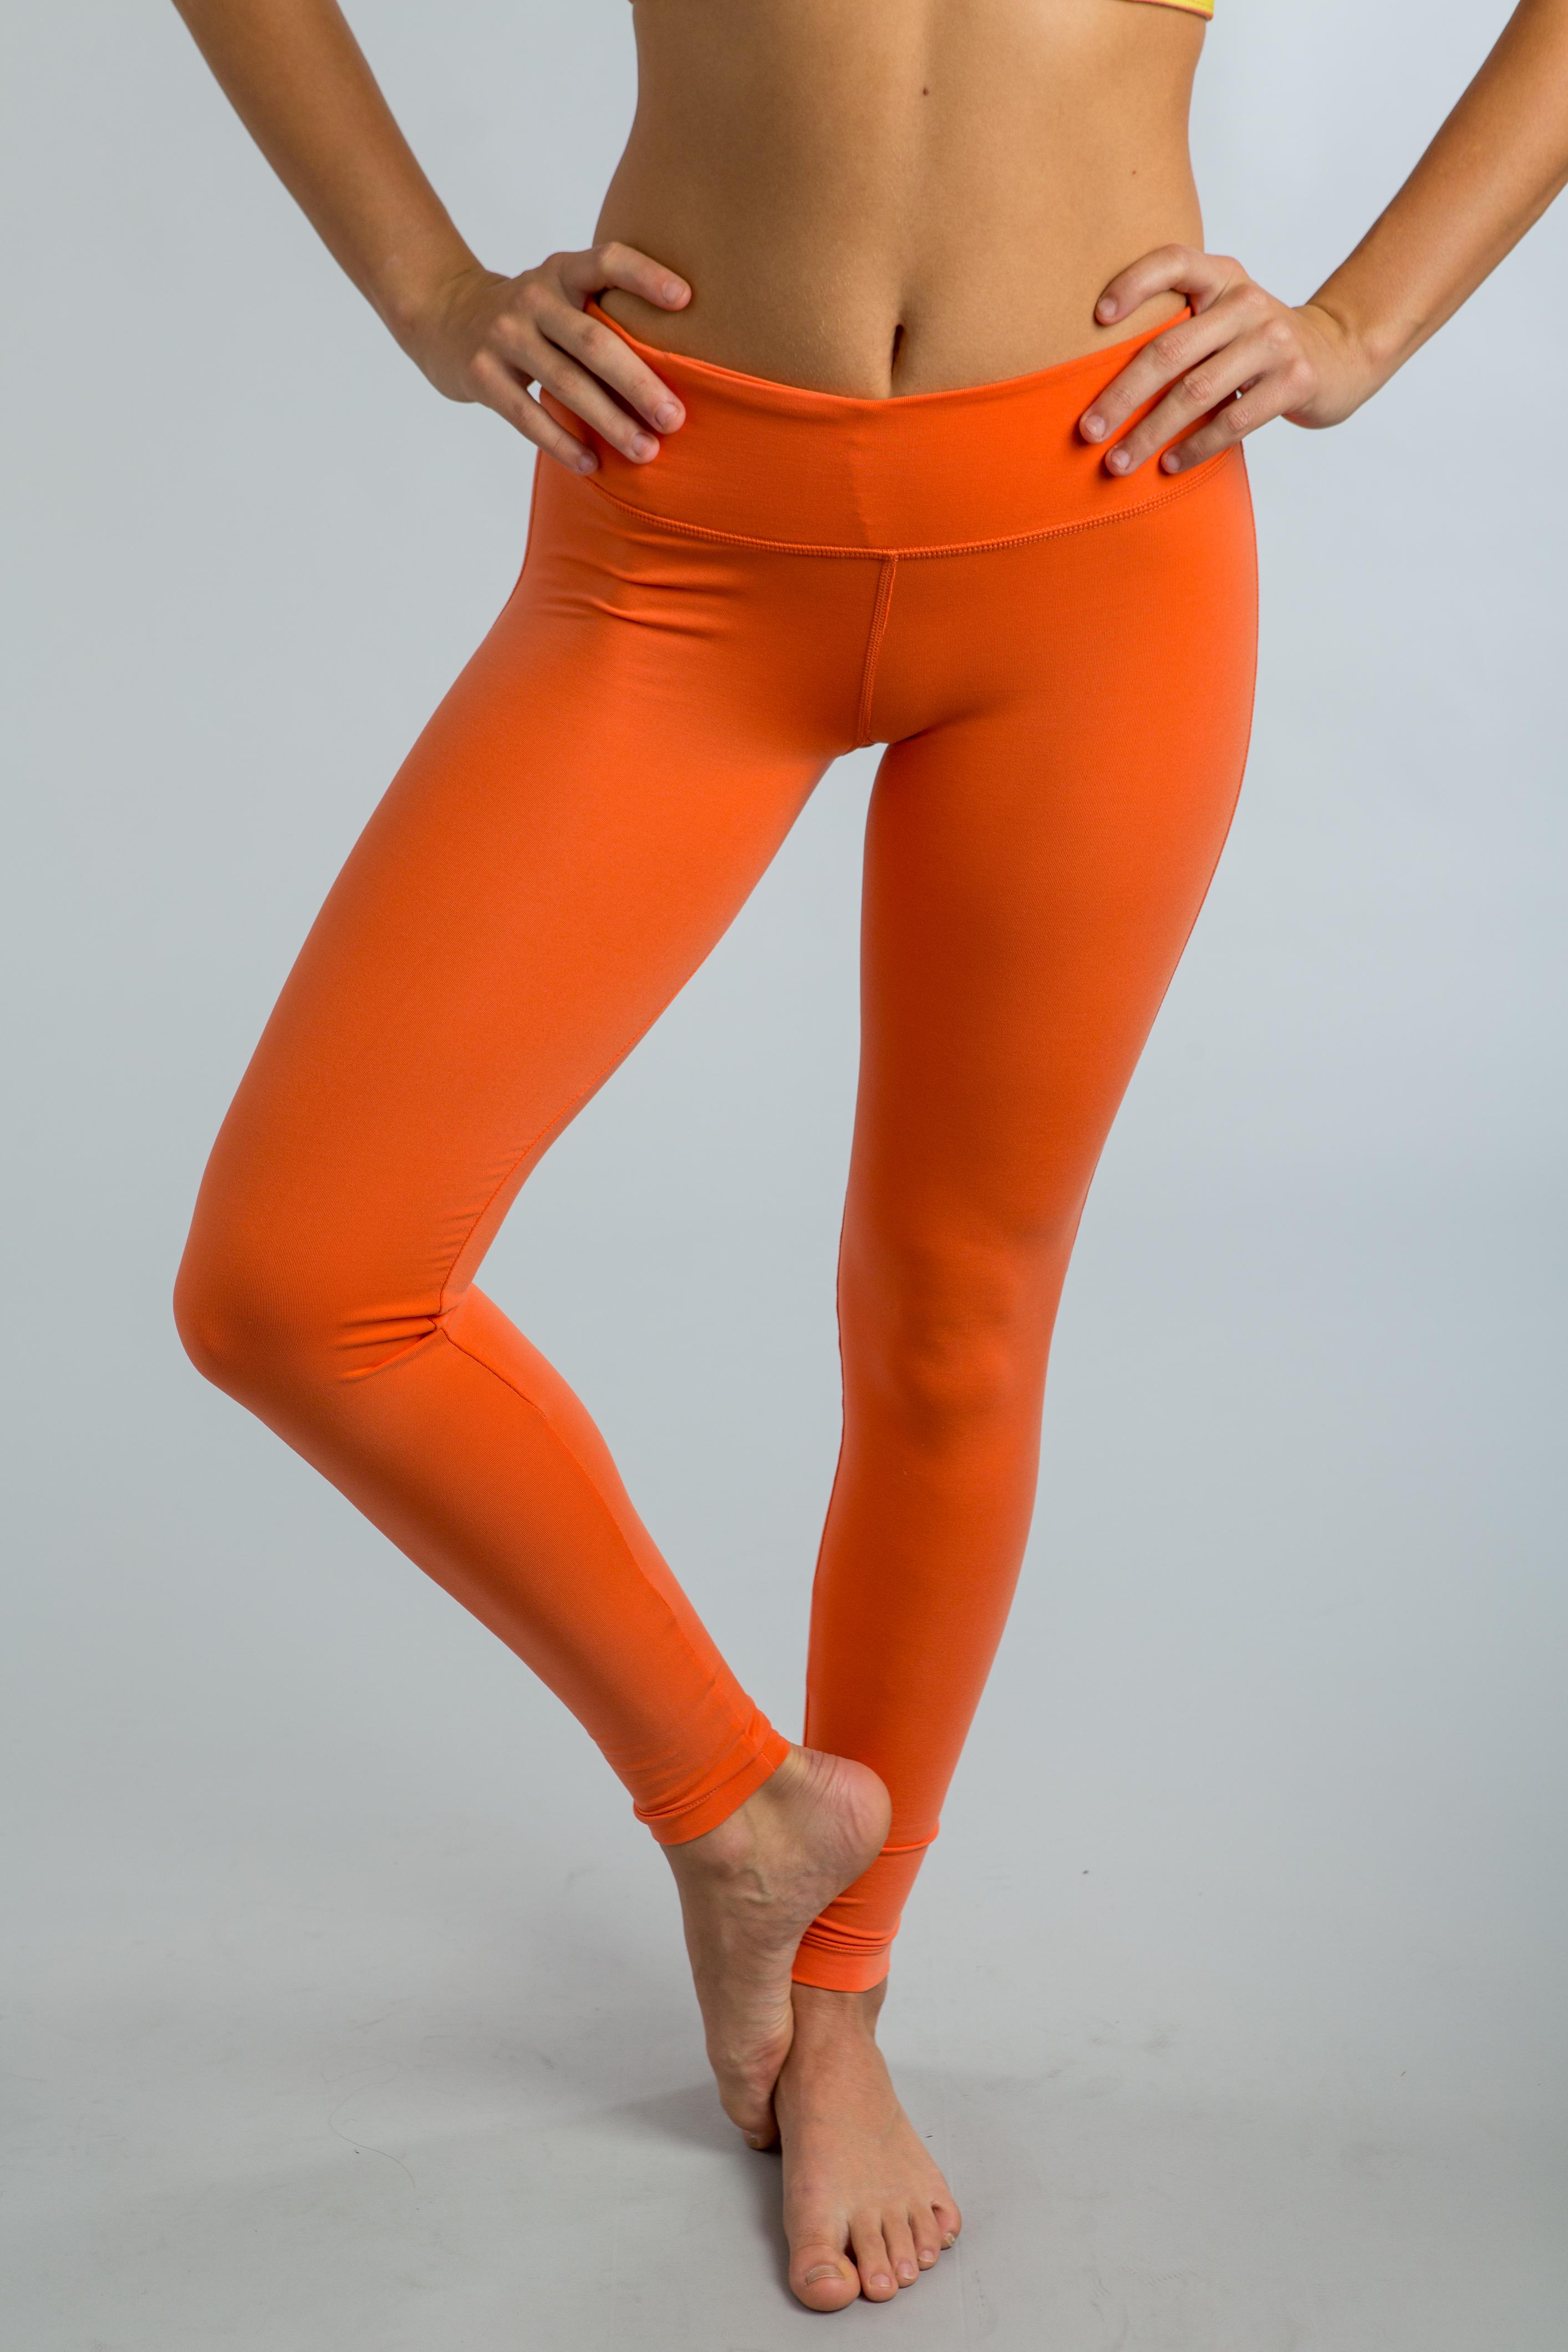 2015 Cozy Orange Papaya Leo Leggings